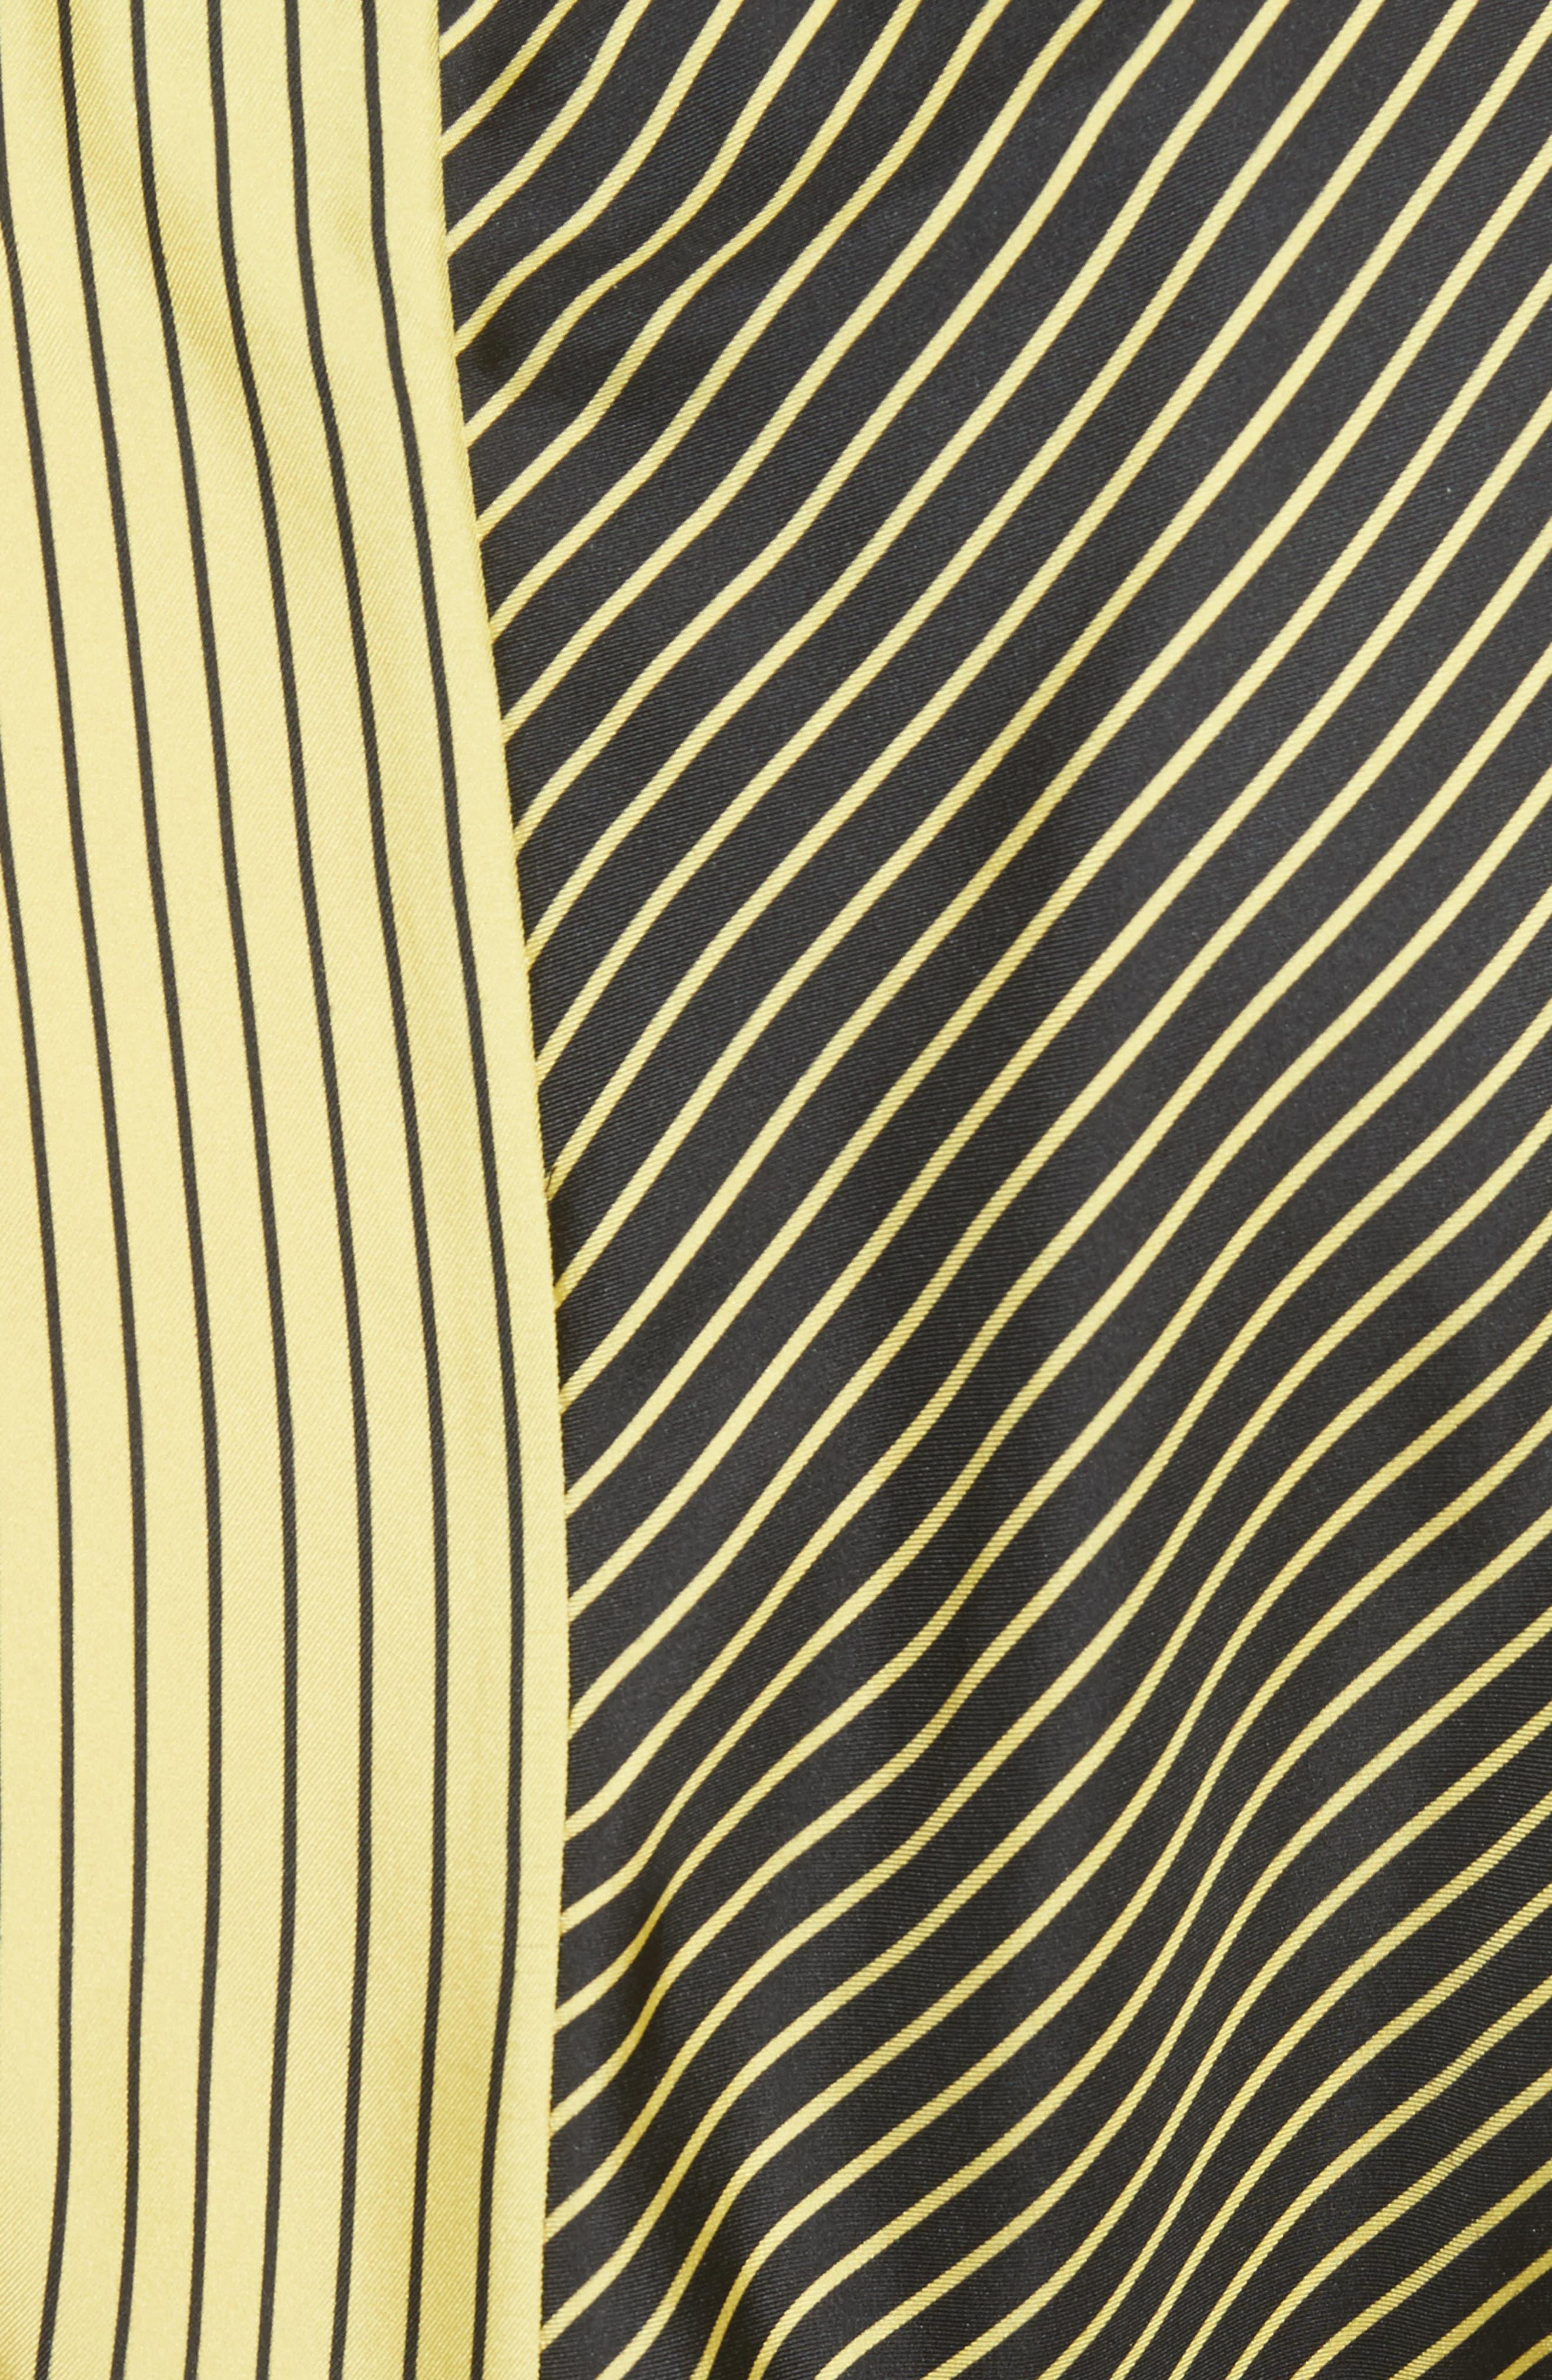 Colorblock Stripe Dress,                             Alternate thumbnail 6, color,                             Black/ Yellow